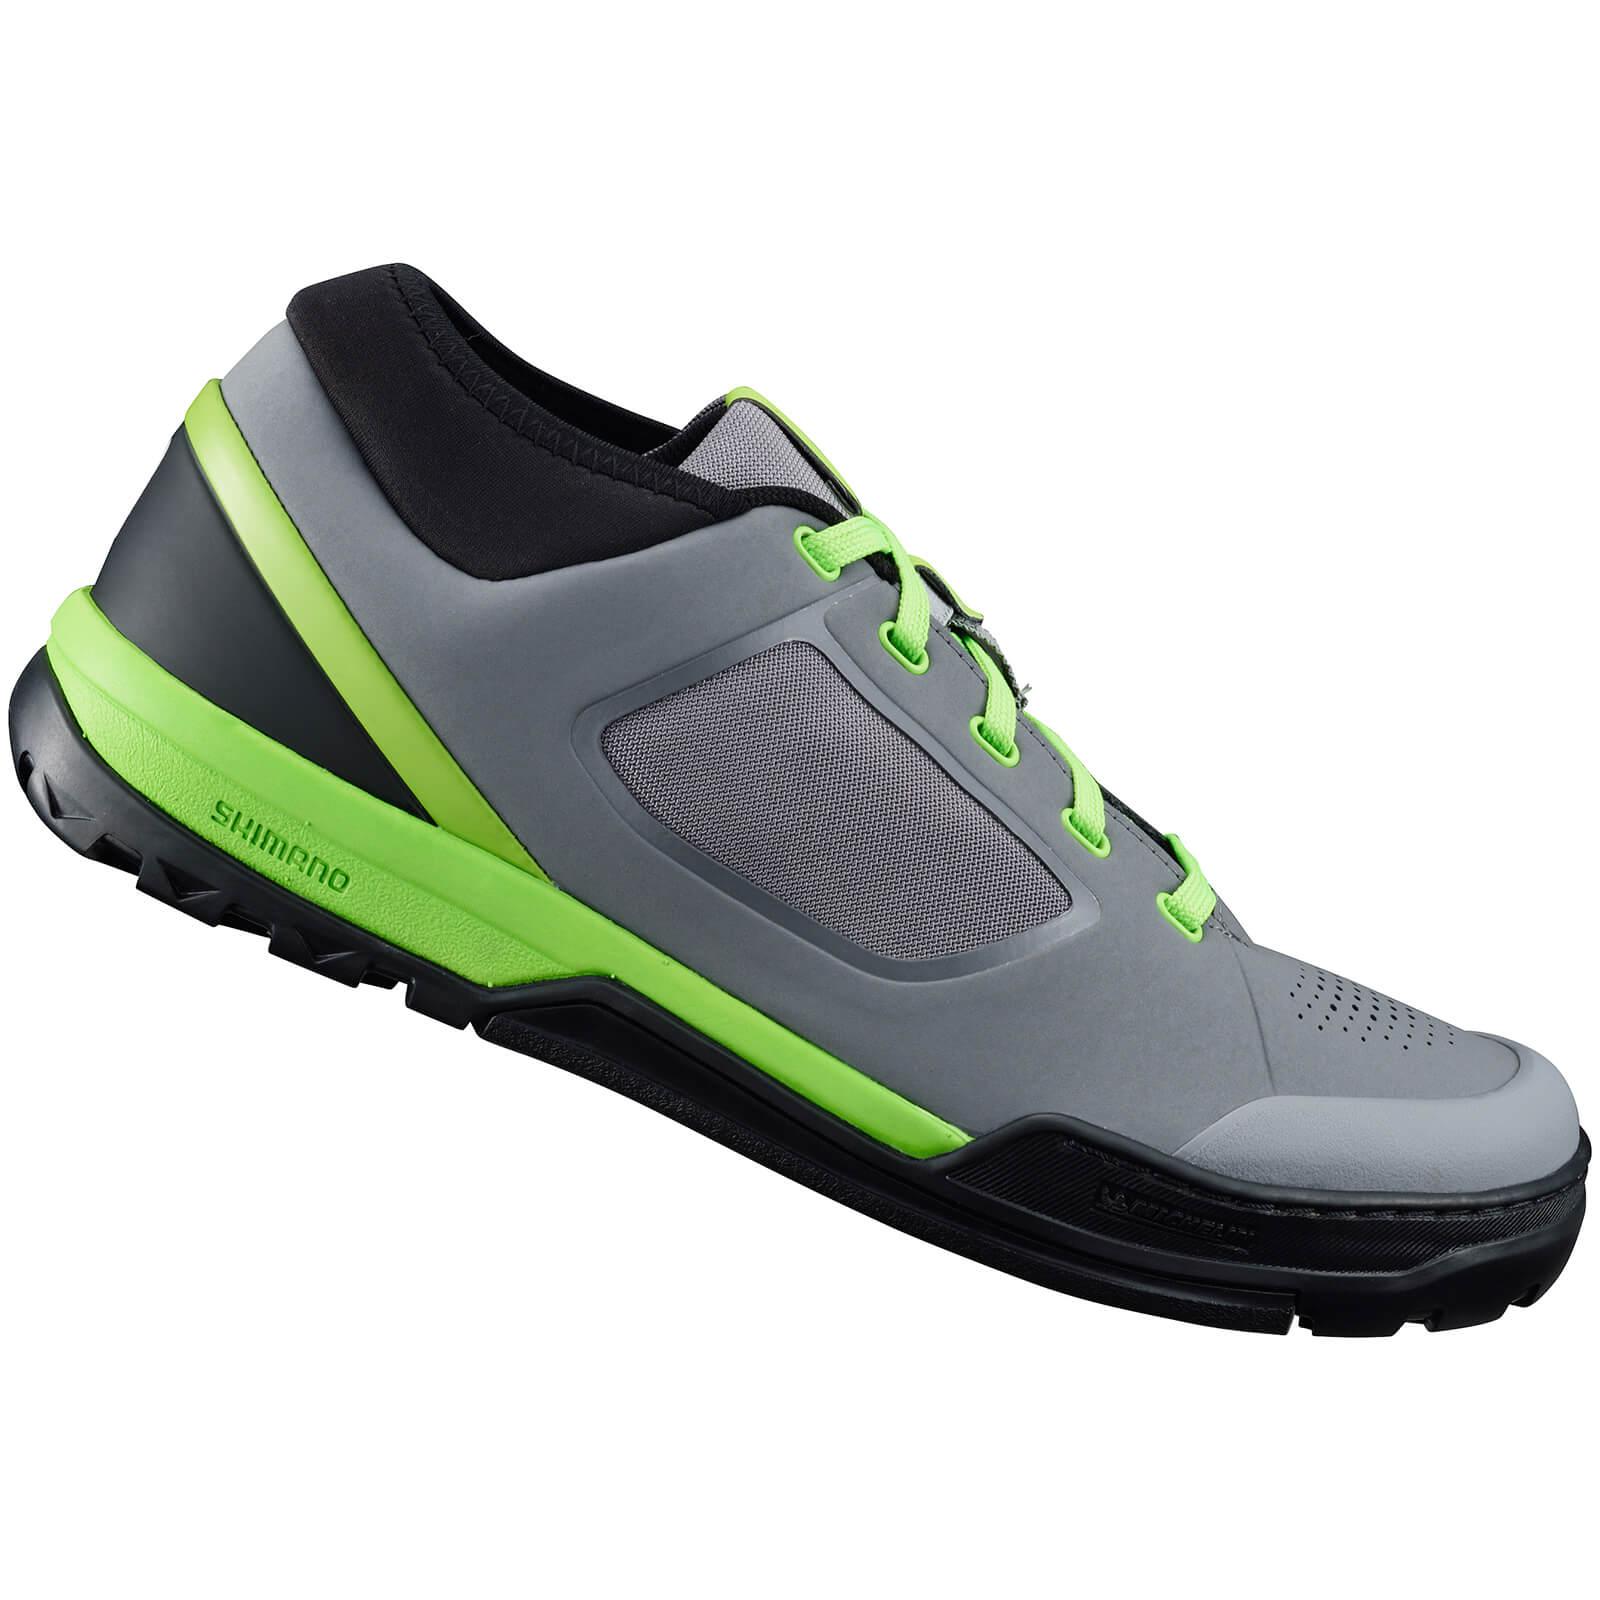 Shimano GR7 MTB Shoes - for Flat Pedals - Blue - EU 44 - Grey/Green